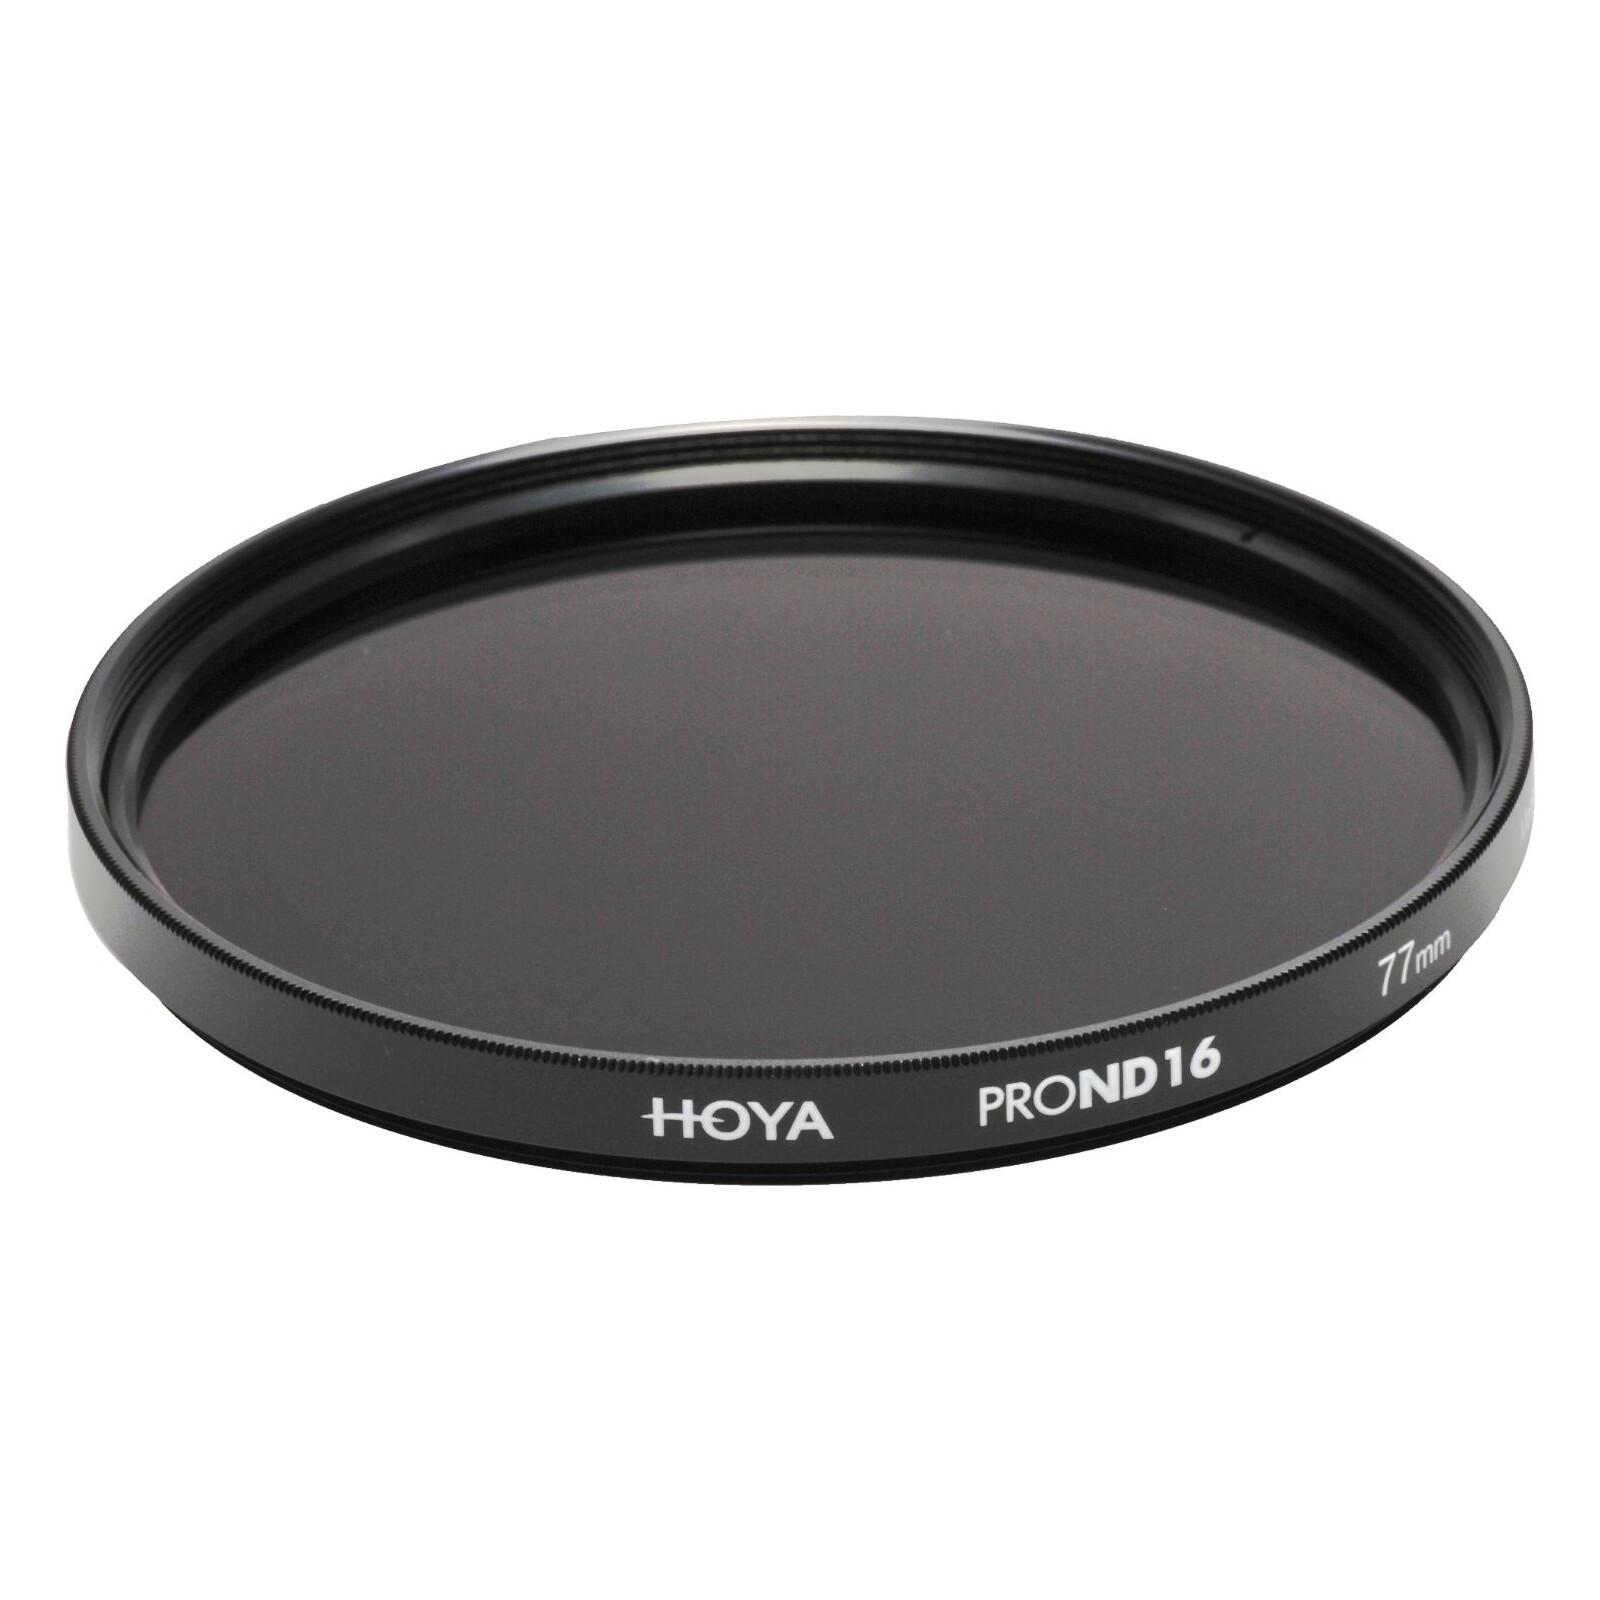 Hoya Grau PRO ND 16 72mm